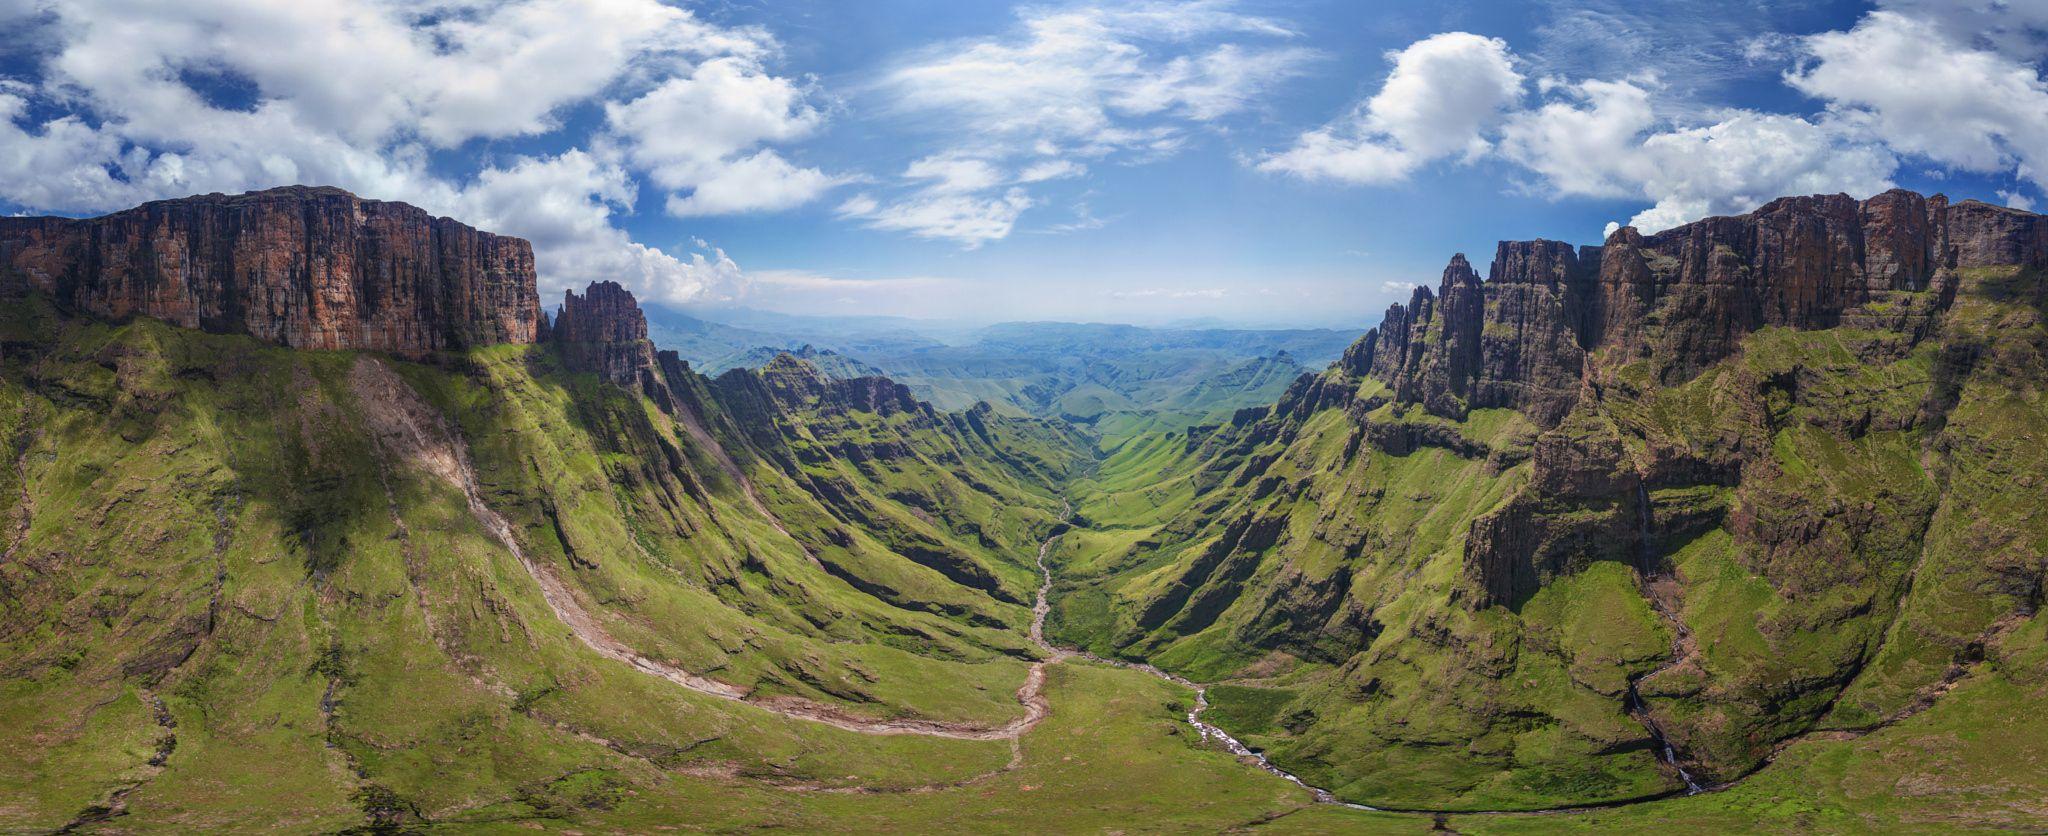 Pin od Ana Vasilevska Spioch na places | Natural wonders, Travel i What a beautiful world